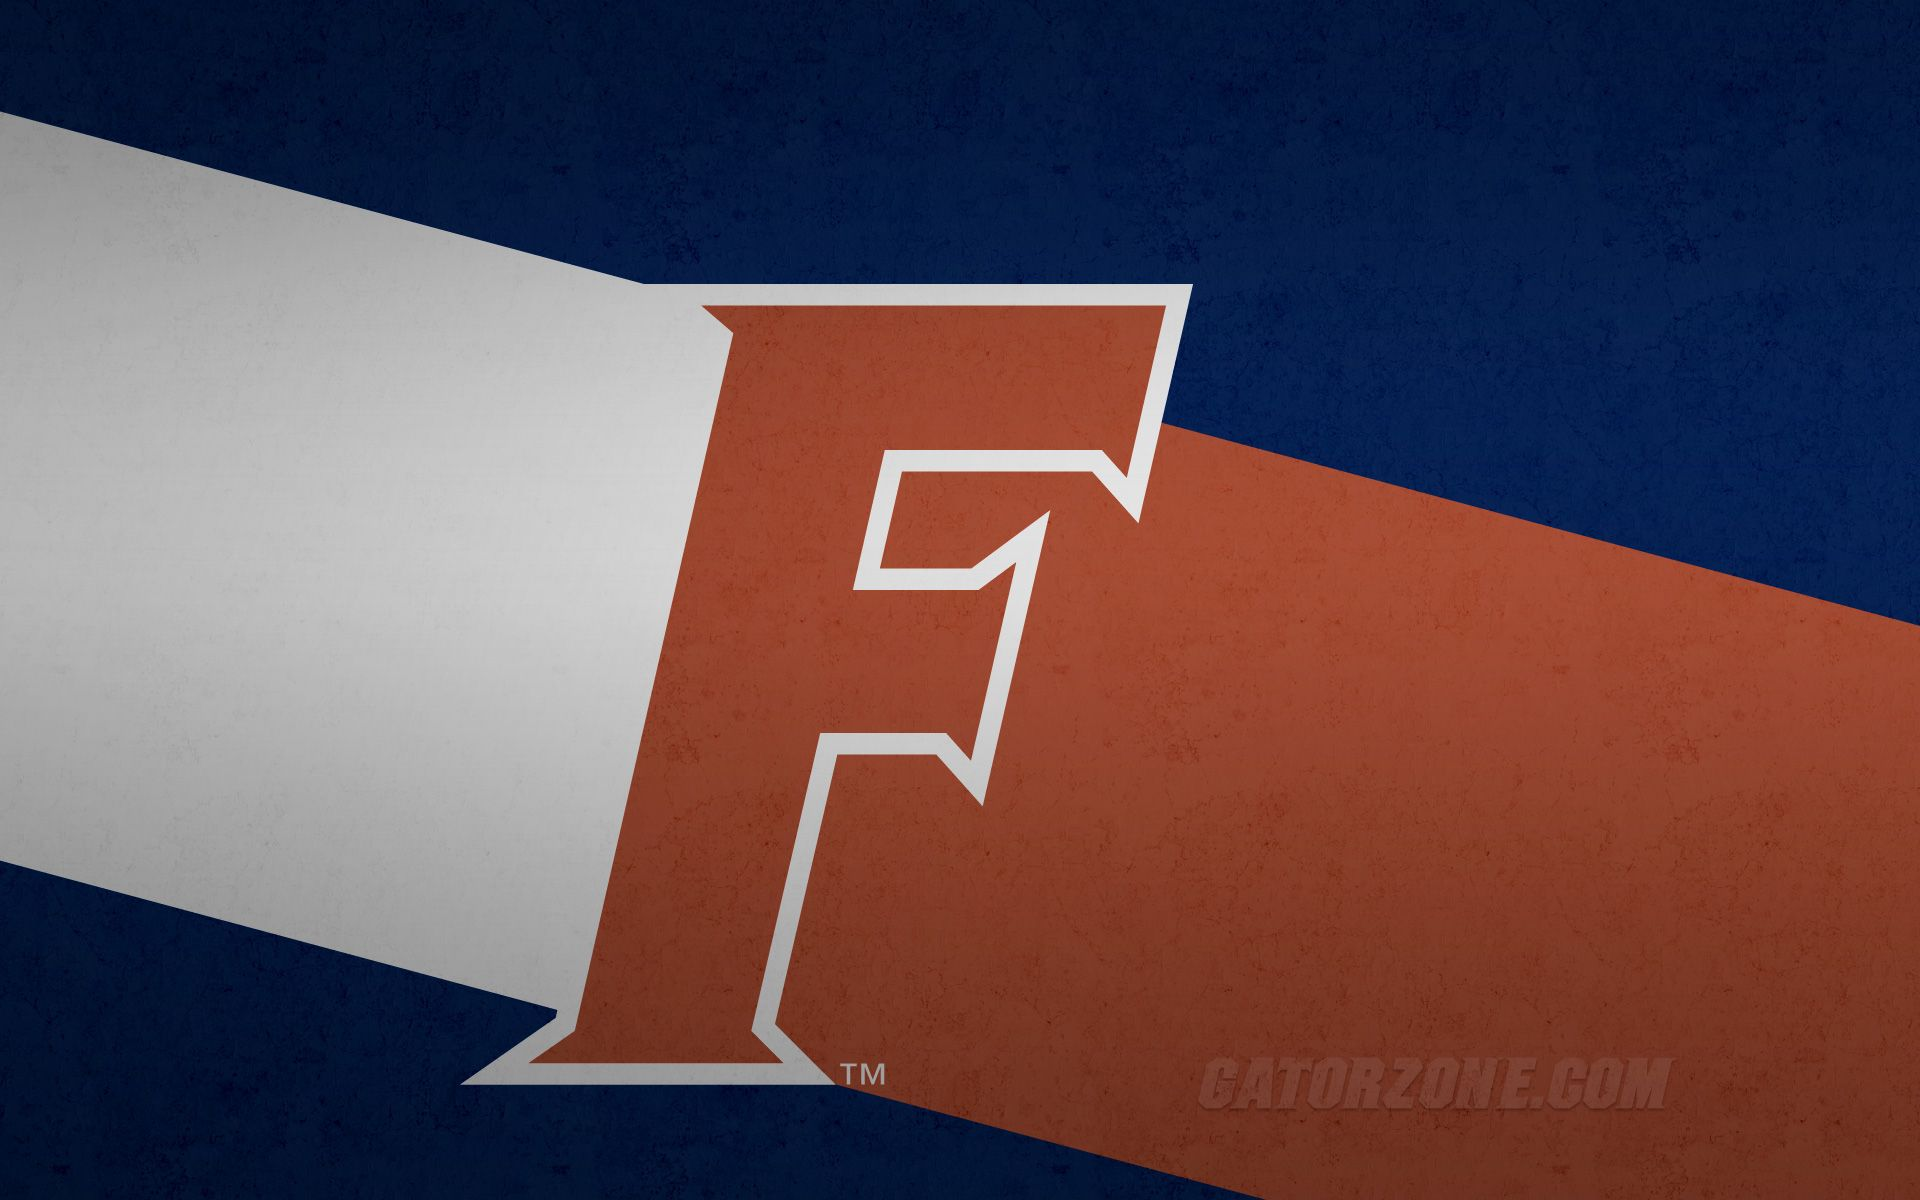 University Of Florida Desktop Wallpapers Top Free University Of